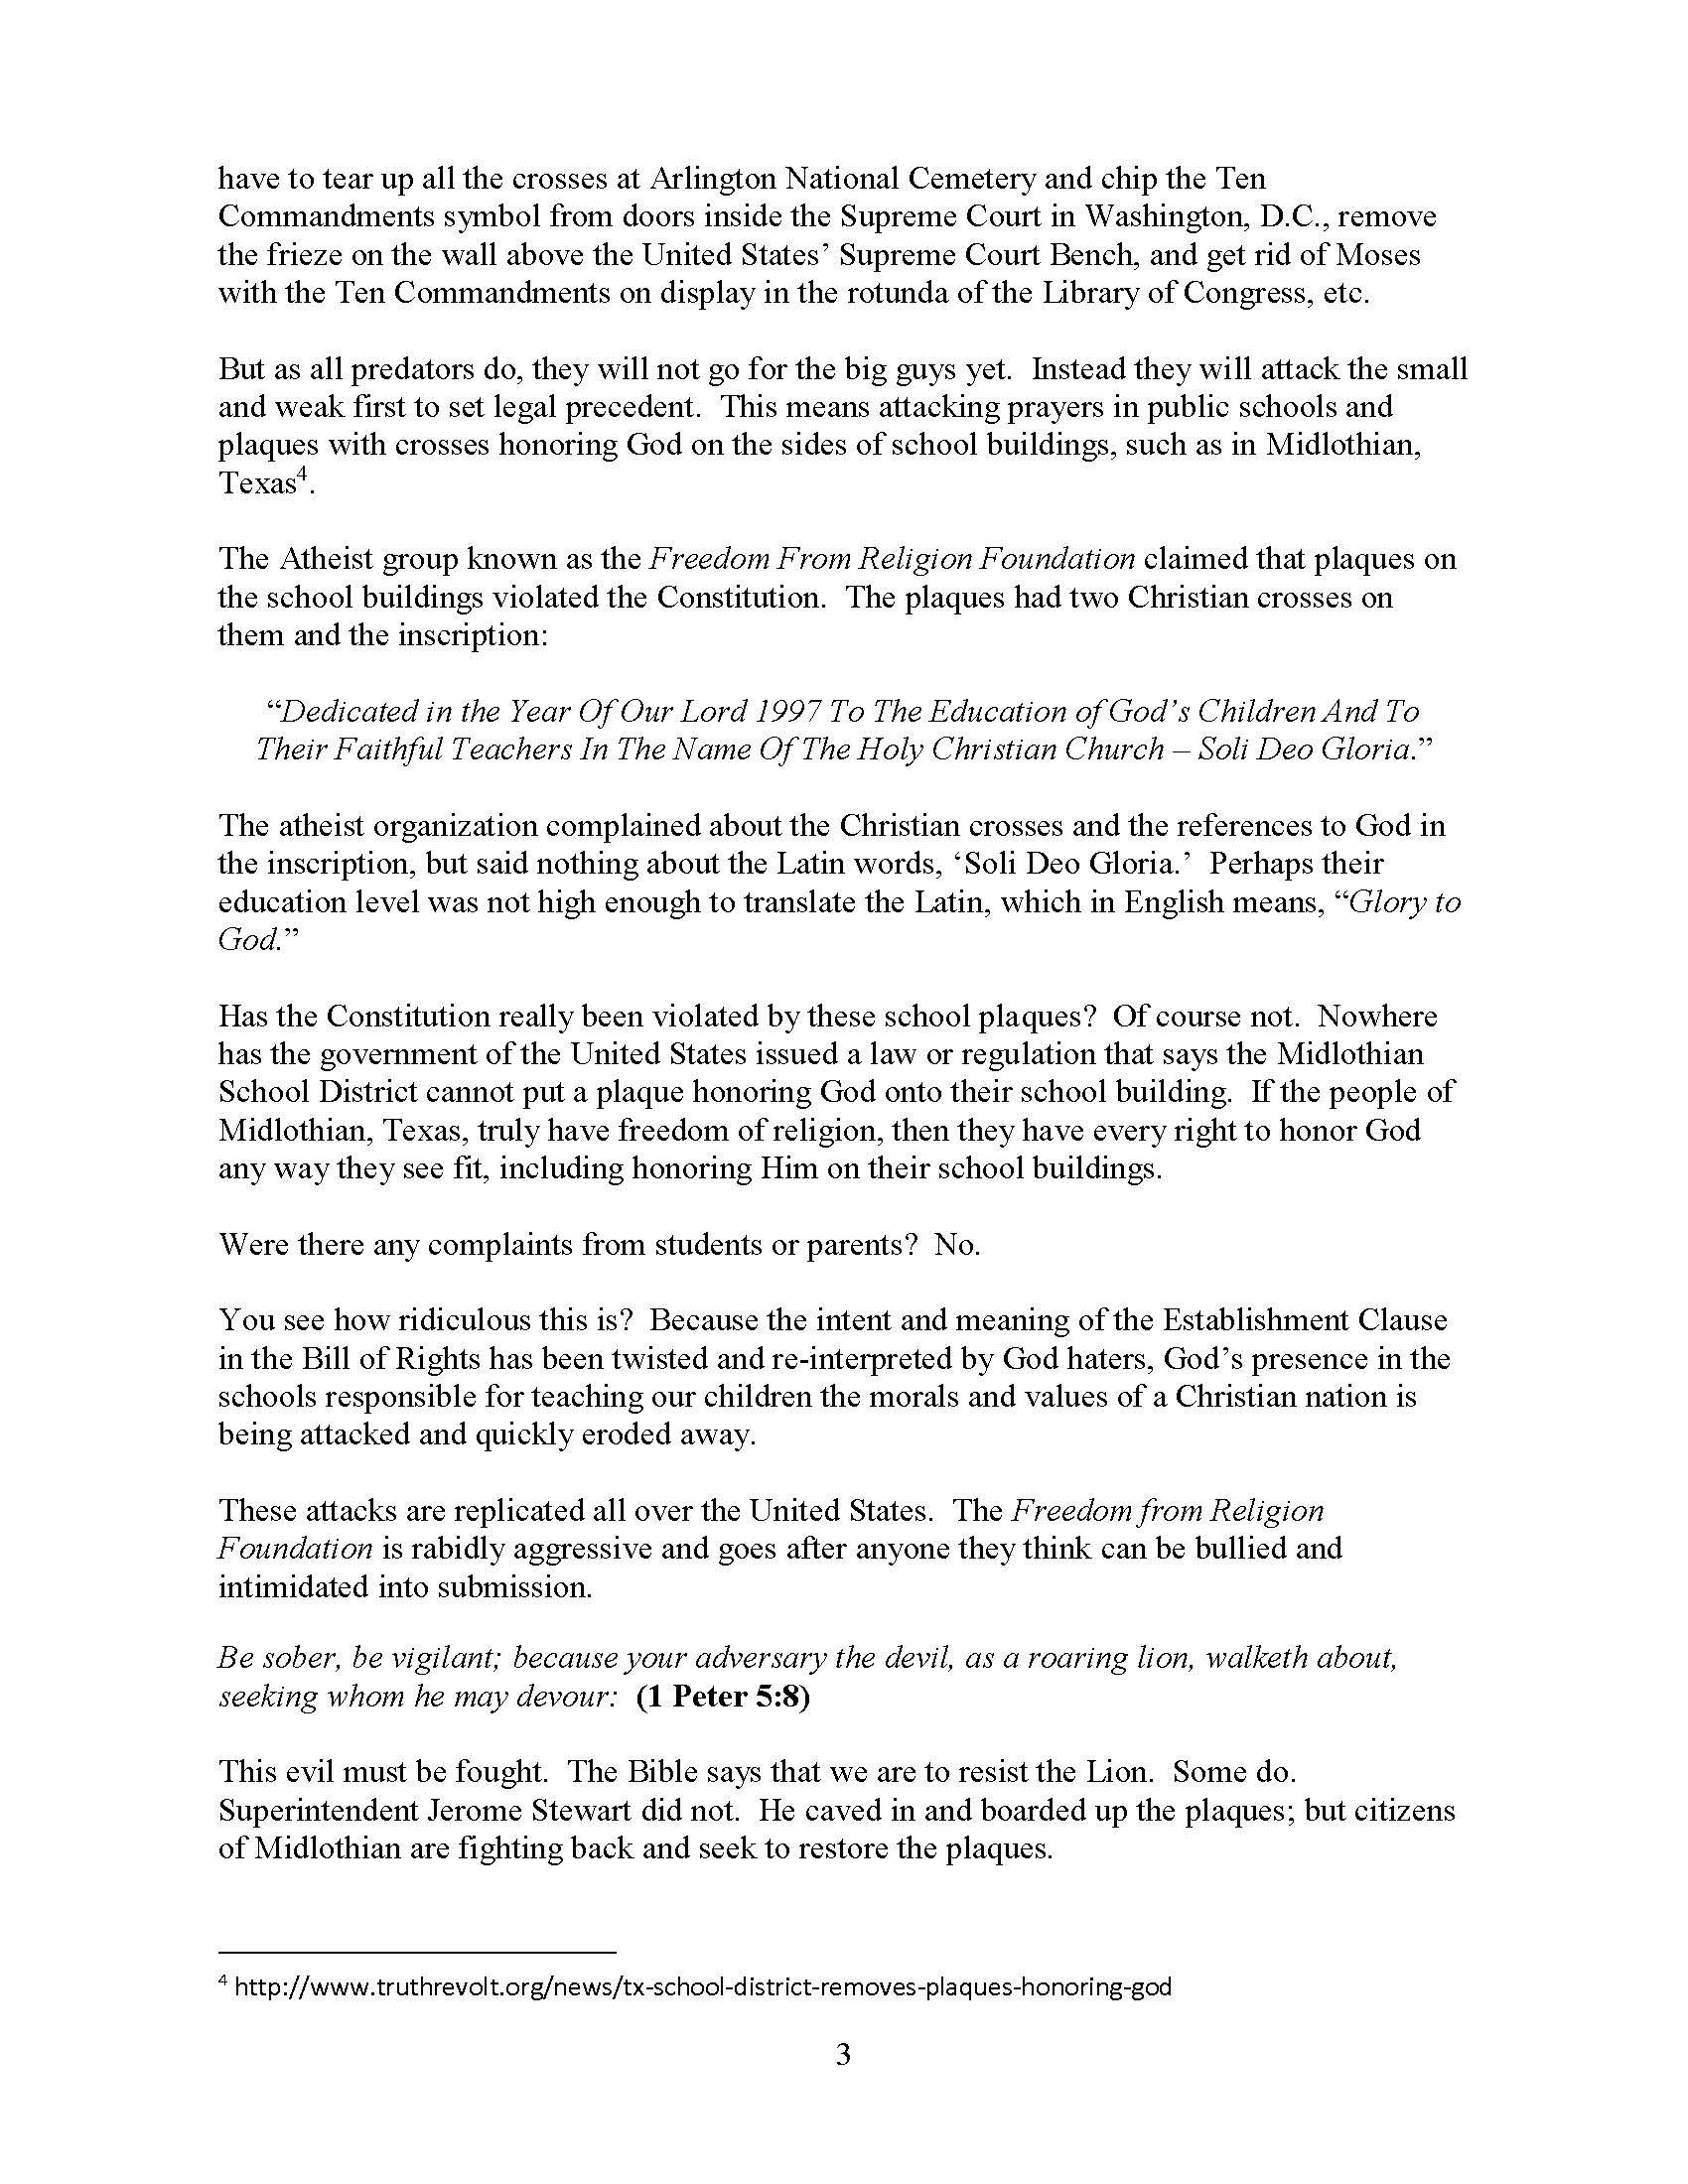 Legacy Letter November 2014_Page_3